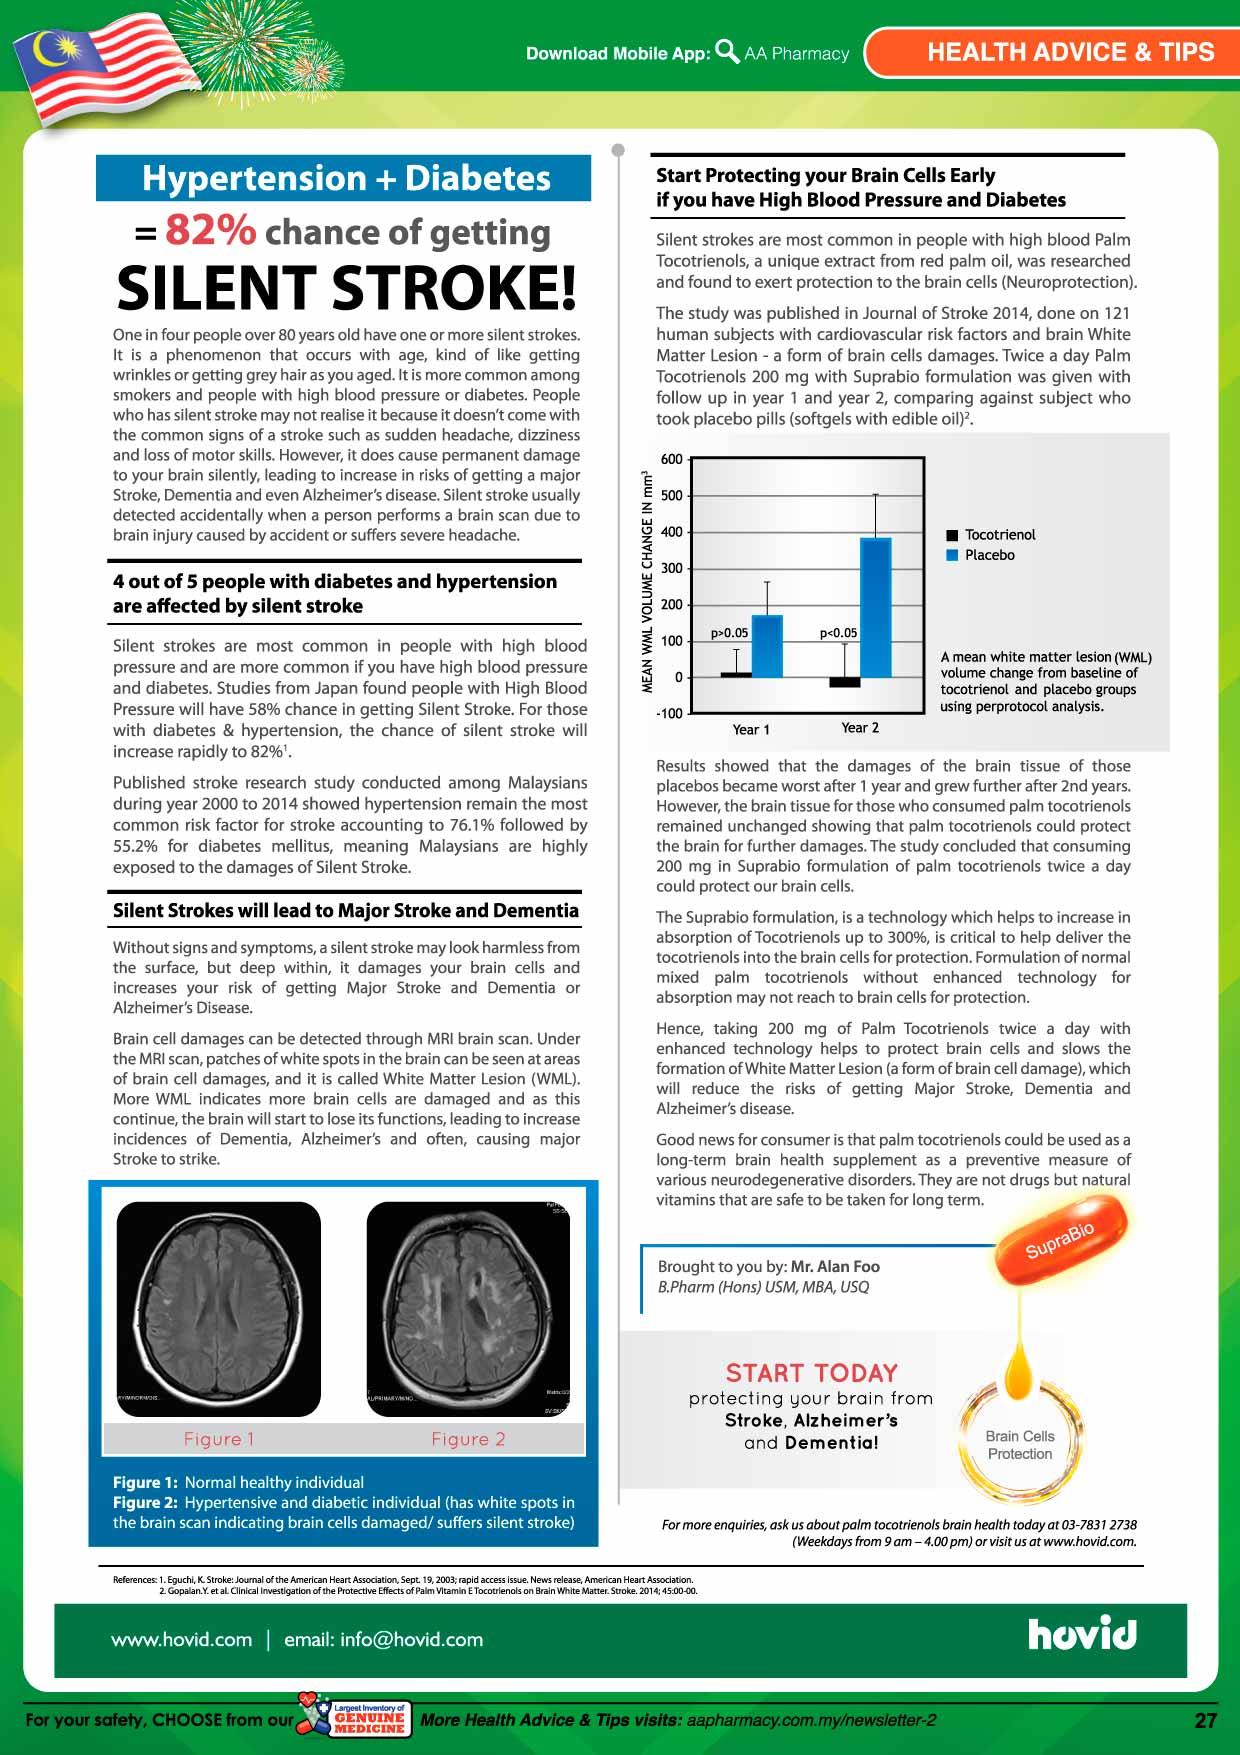 Page-27-OL